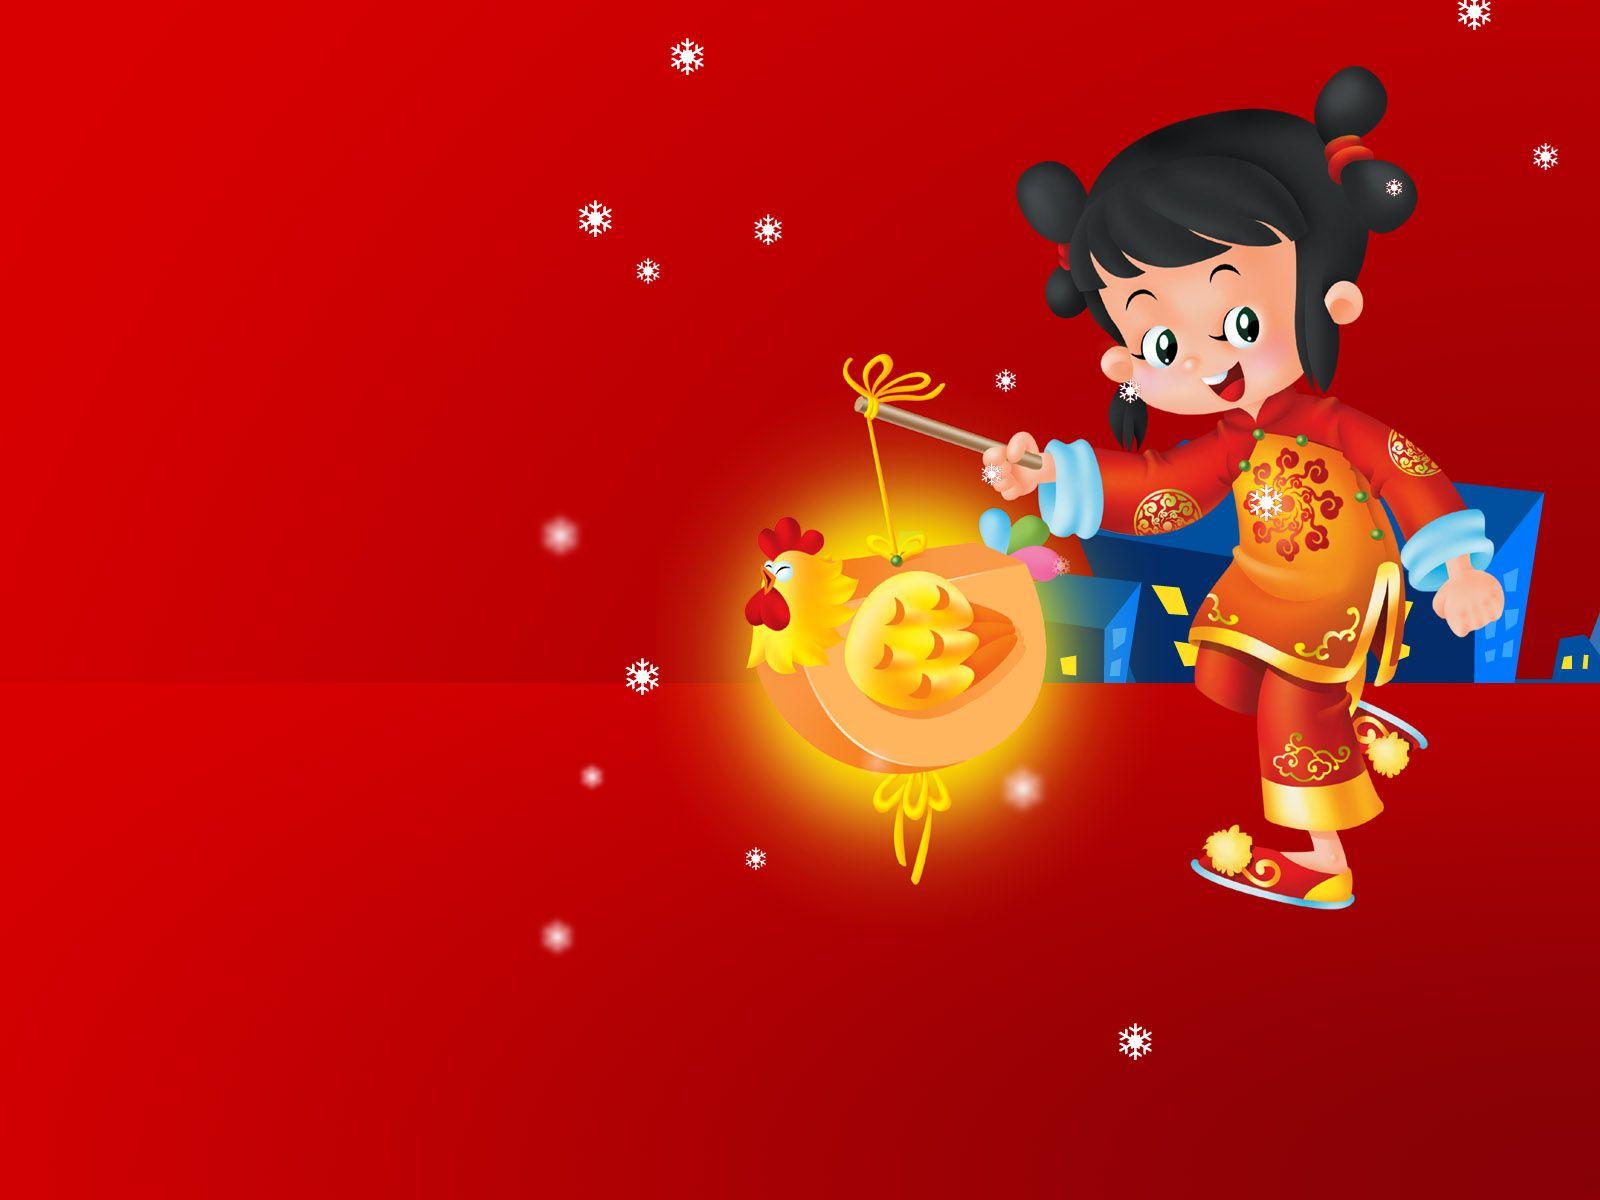 Chinese New Year 2014 Desktop Wallpaper   Wallpaper High Definition 1600x1200